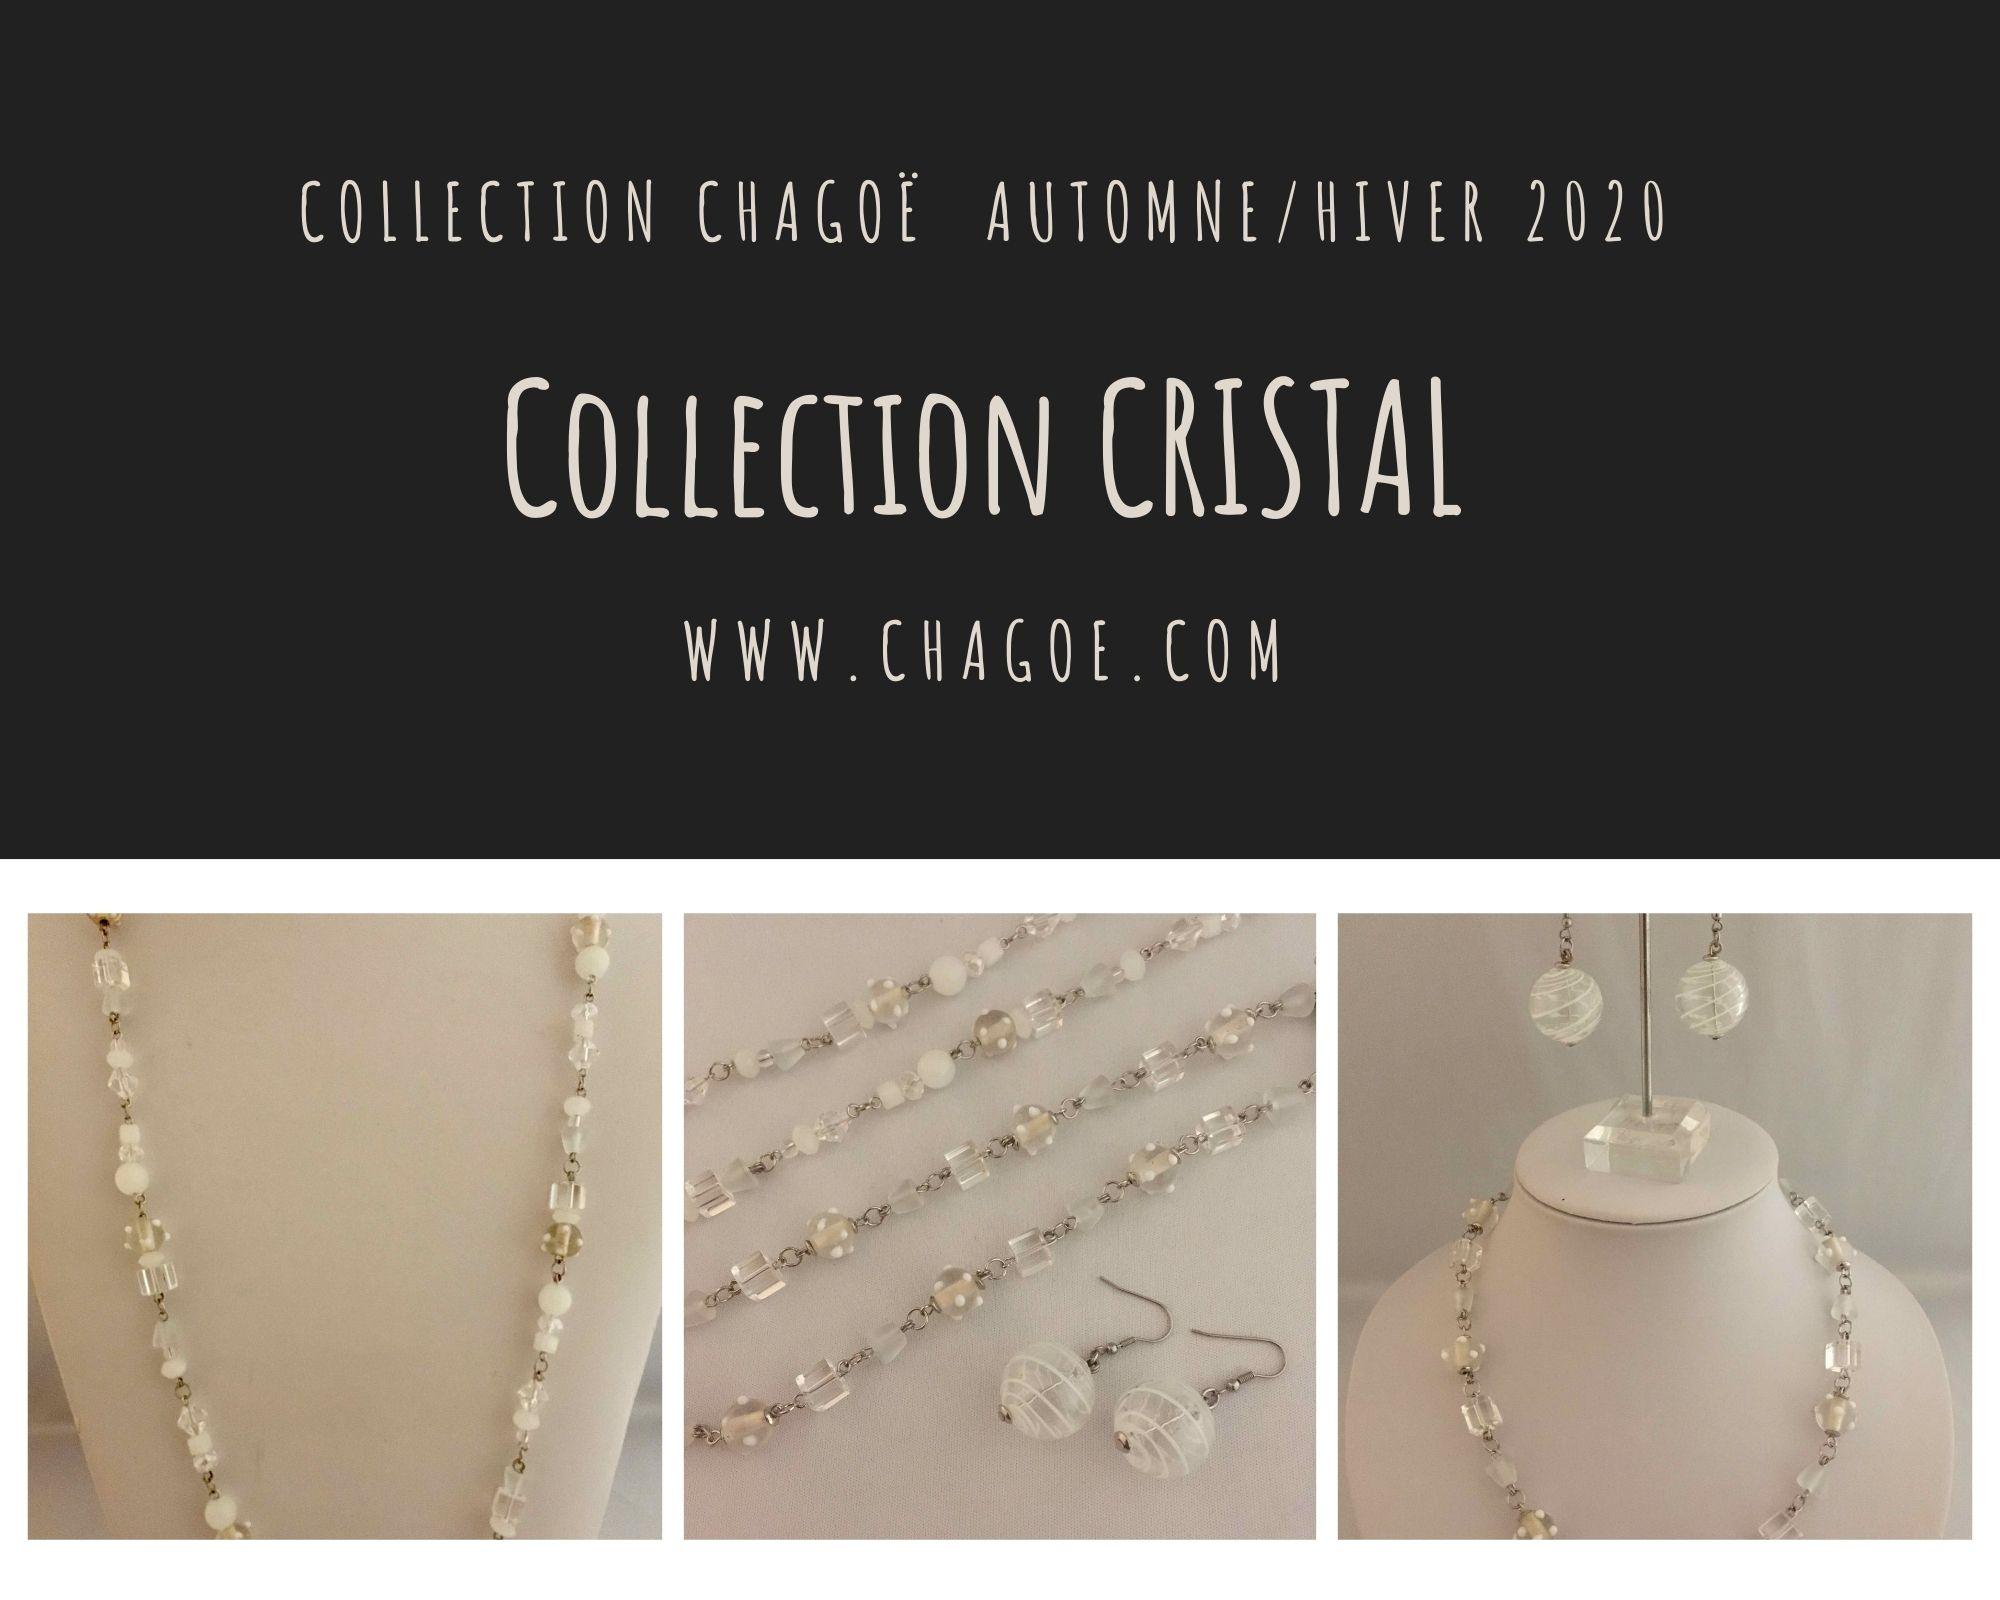 Collection CRISTAL Chagoë 2020